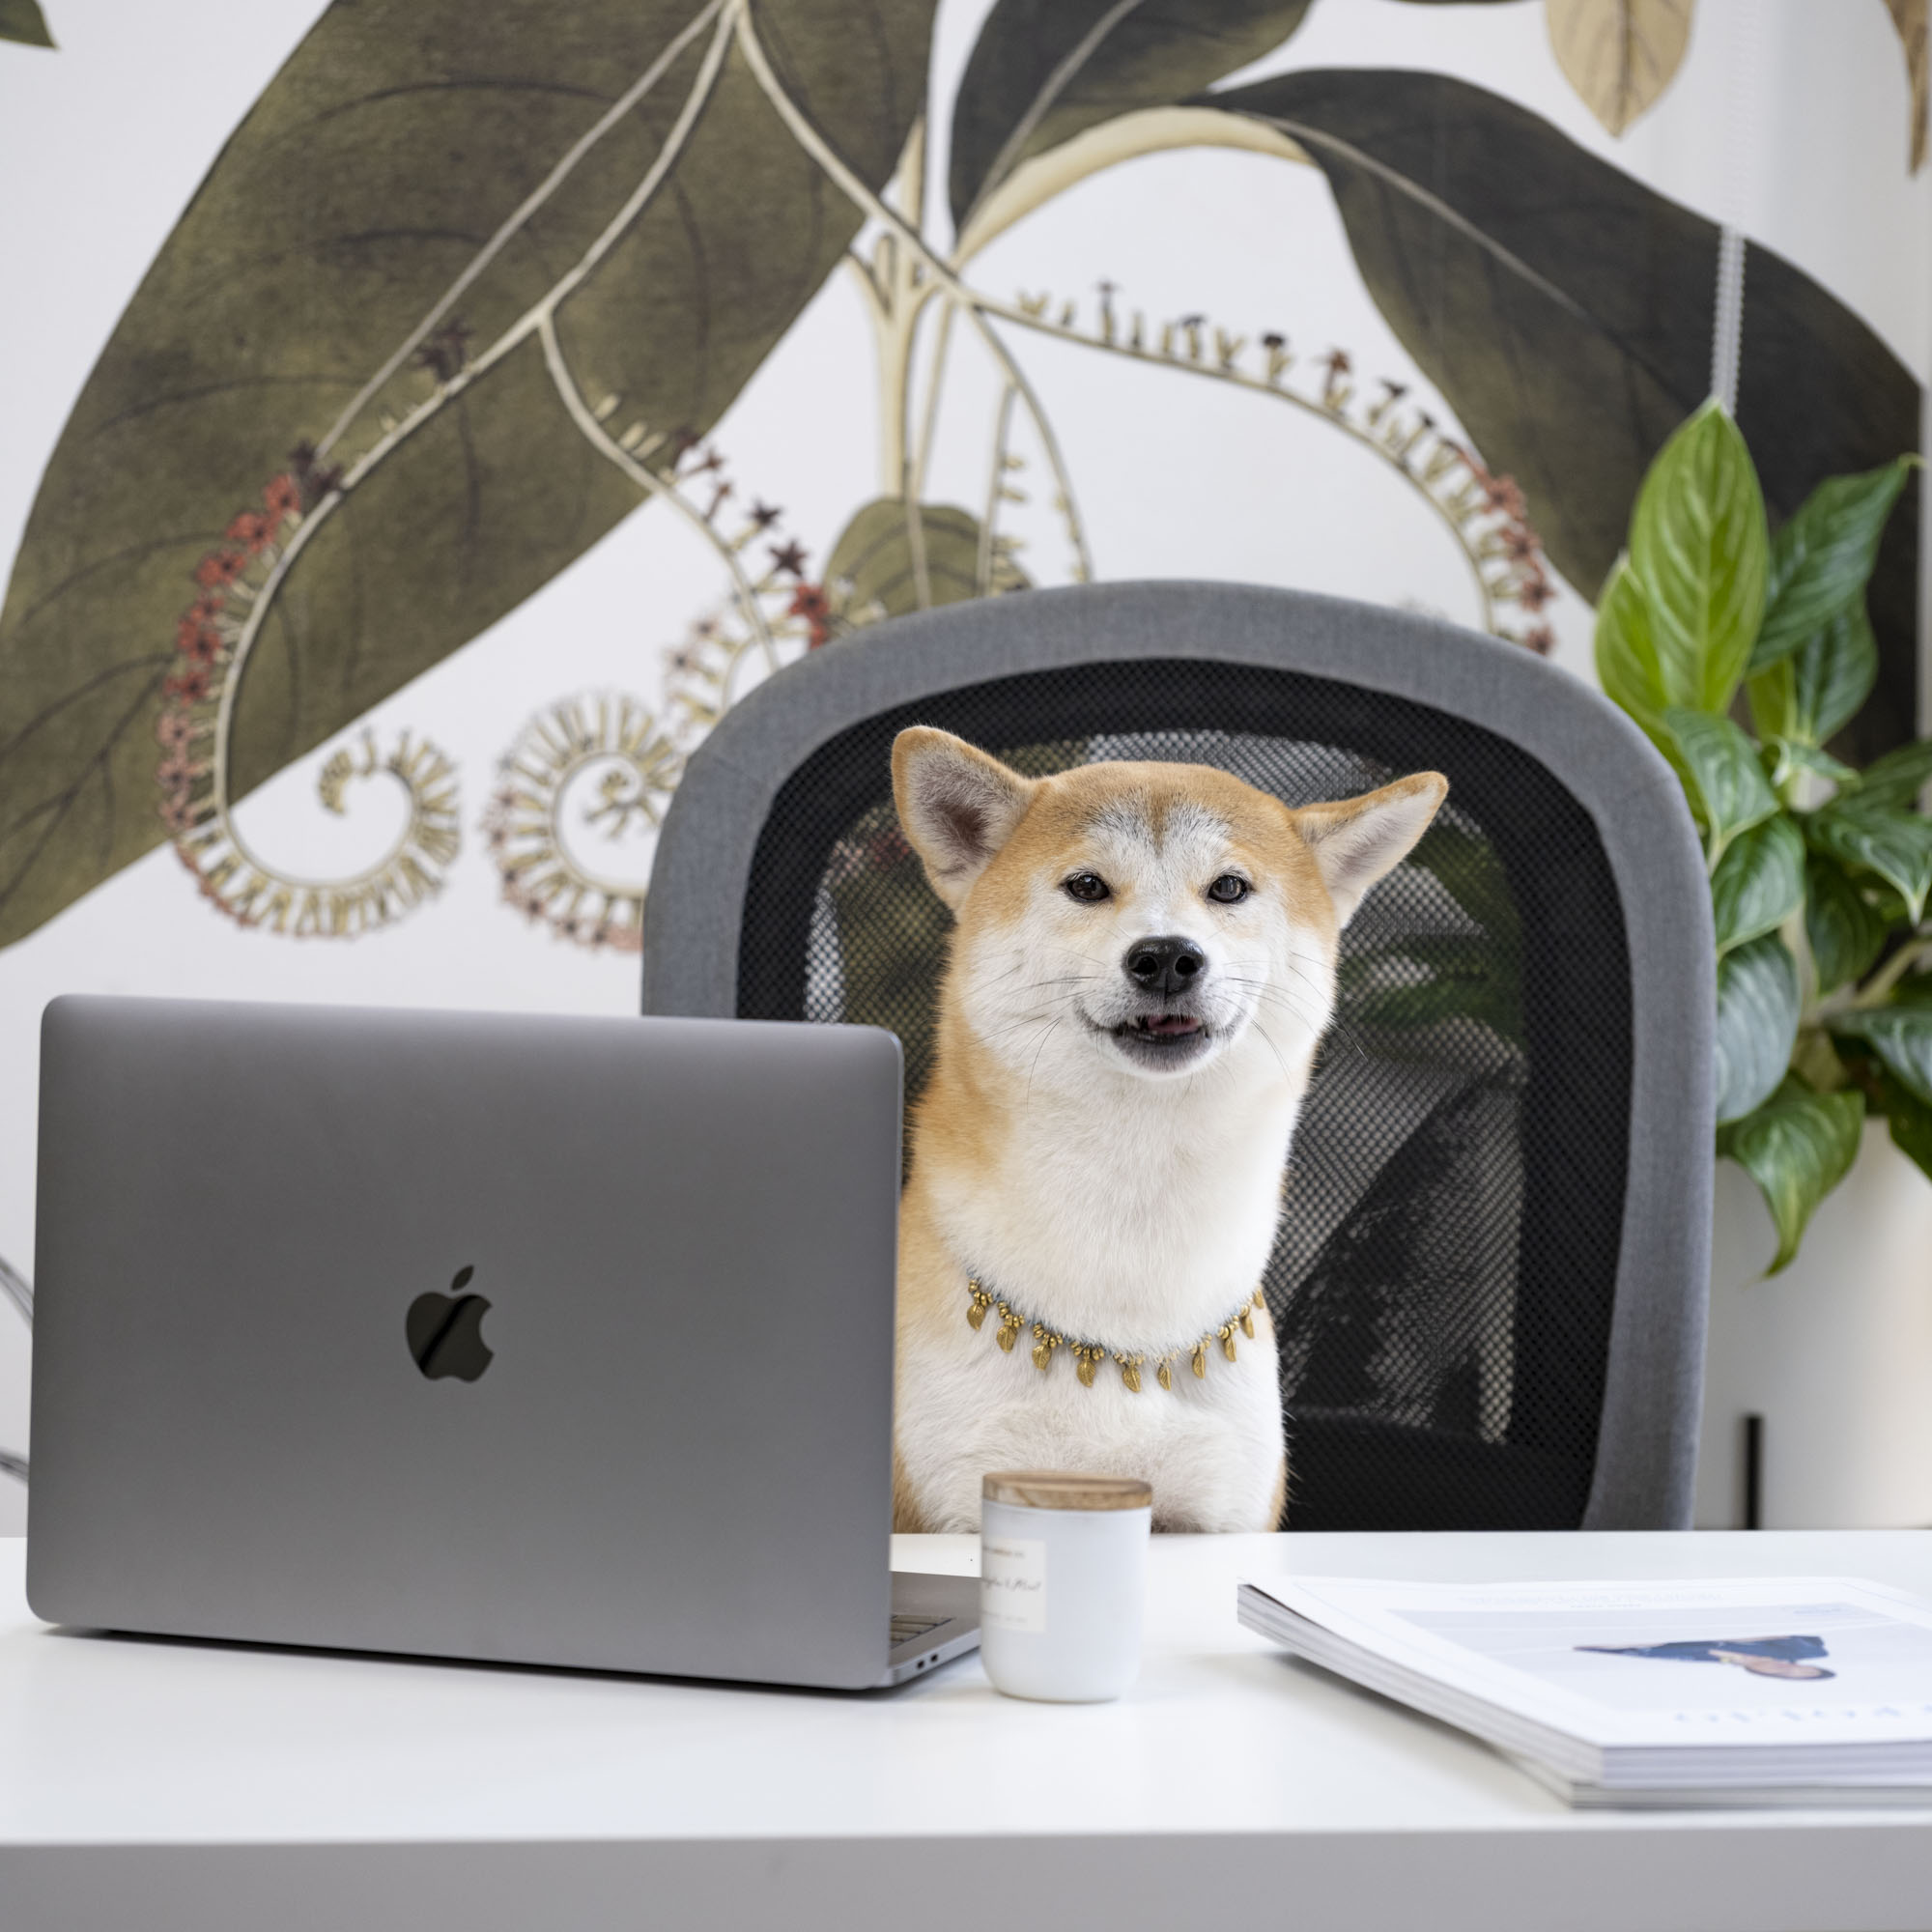 Corporate headshot portrait linkedin profil photography studio singapore services asia photographer coco pr agency shiba dog